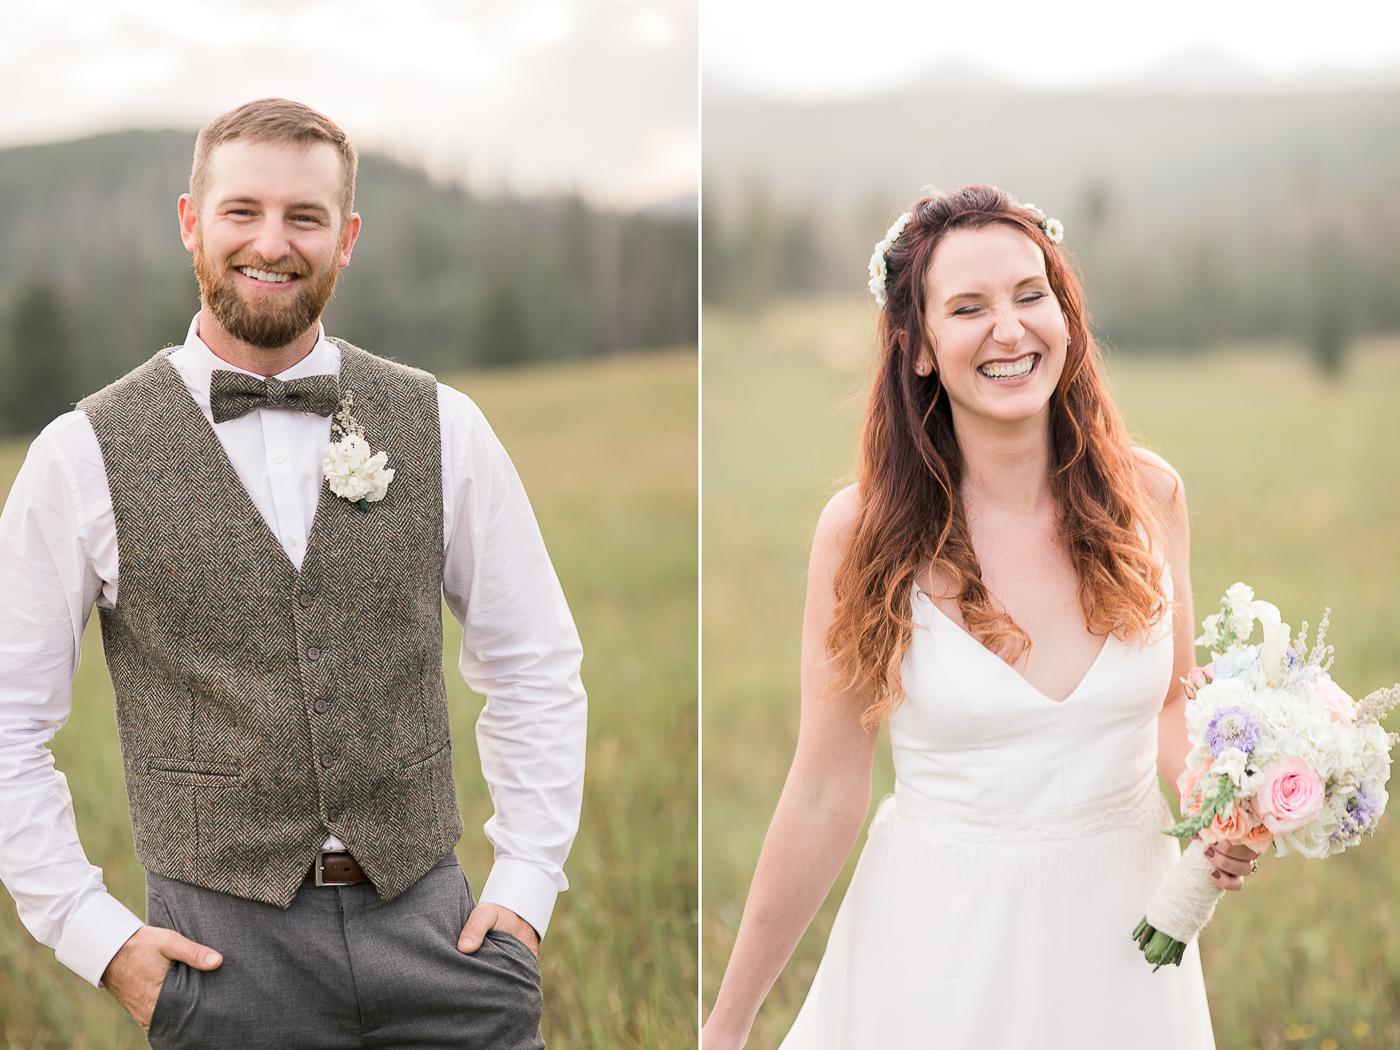 Colorado Mountain Wedding by Megan Lee Photography